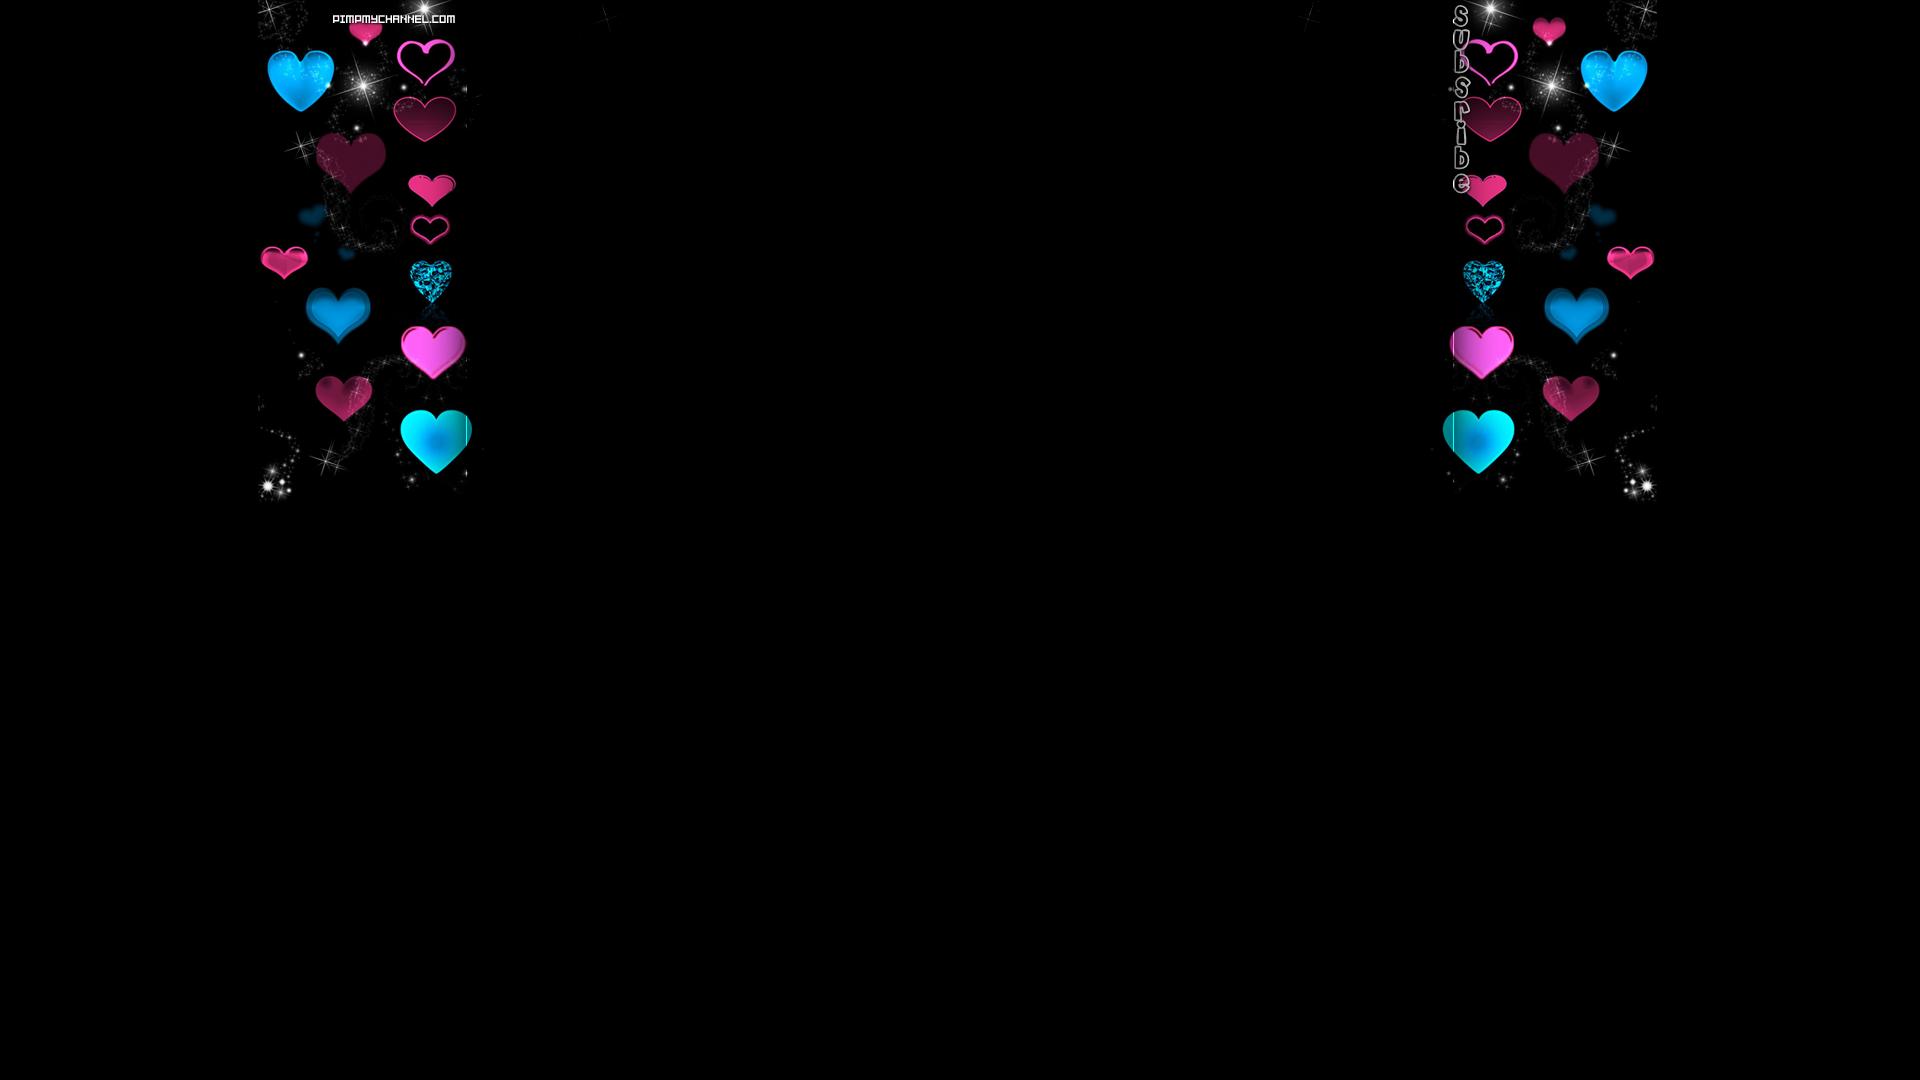 Cute Black Wallpapers - Wallpaper Cave